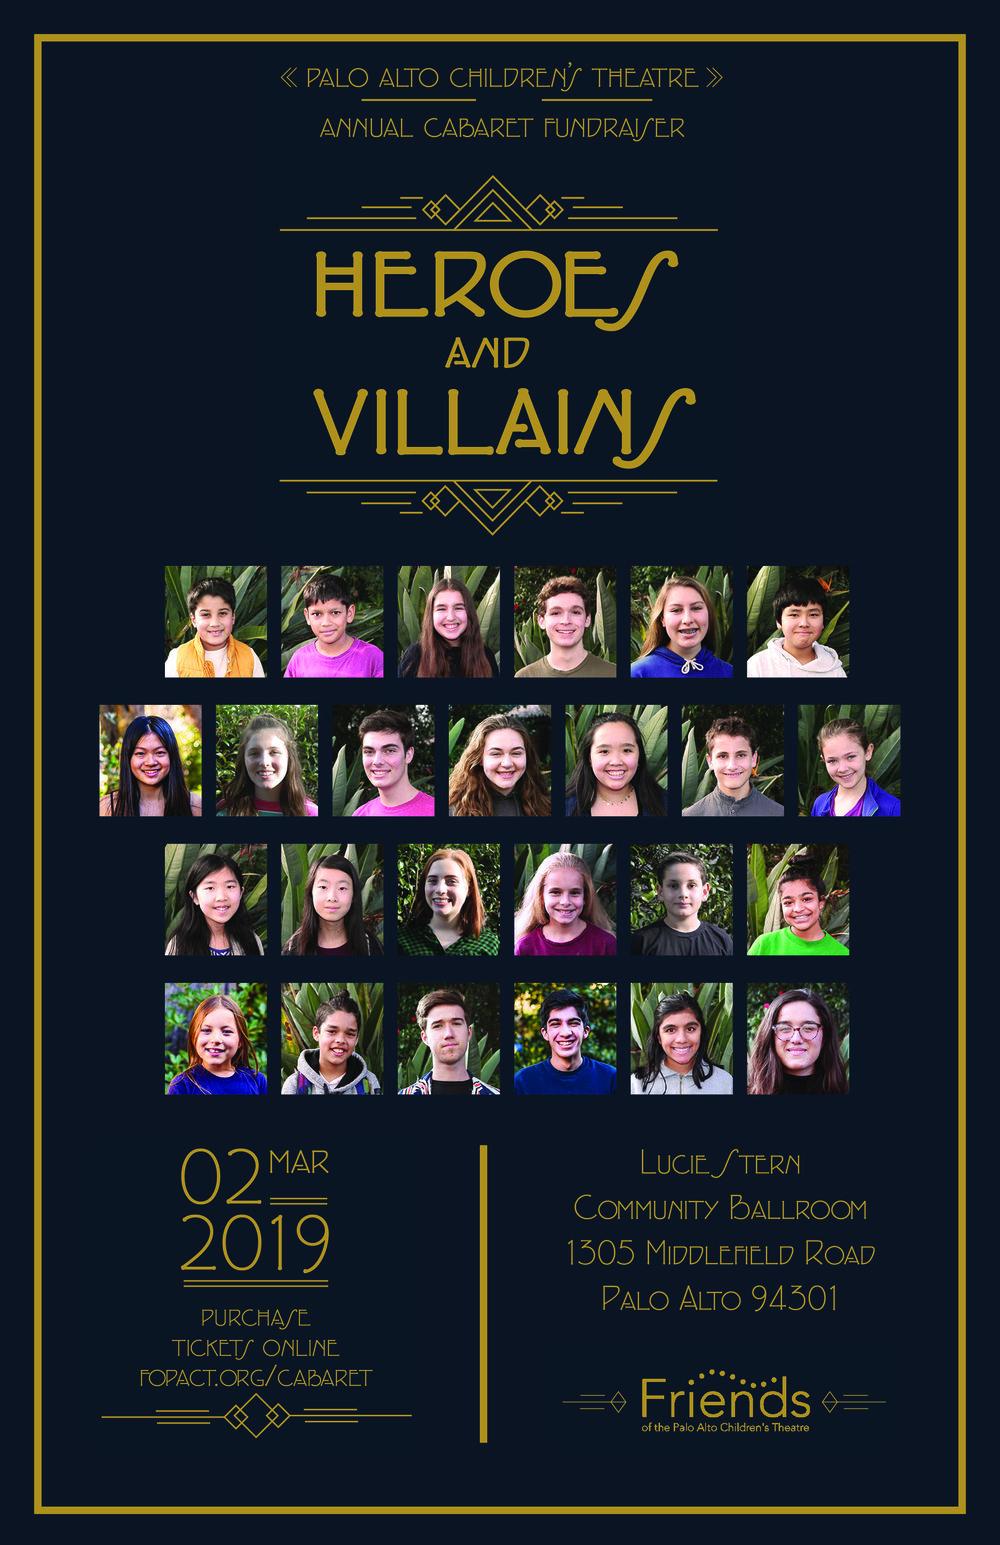 Promotional Poster for Palo Alto Children's Theatre production